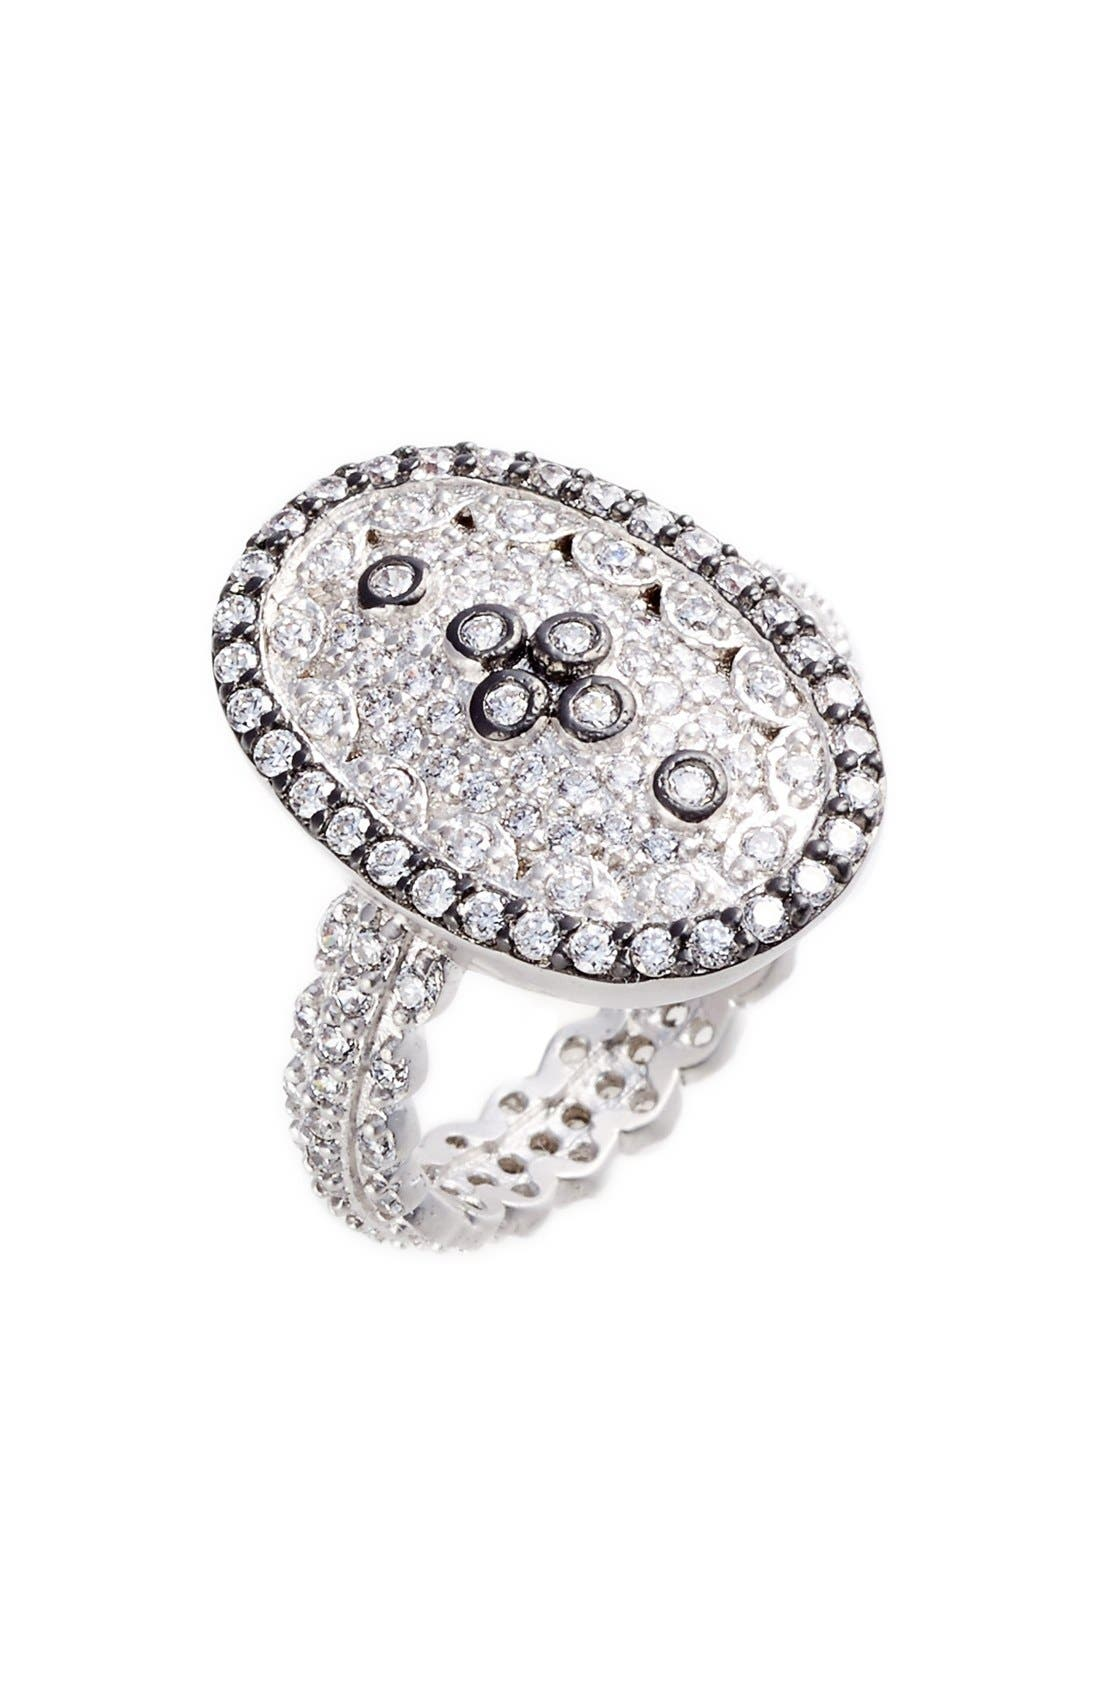 Main Image - FREIDA ROTHMAN Pavé Cubic Zirconia Clover Ring